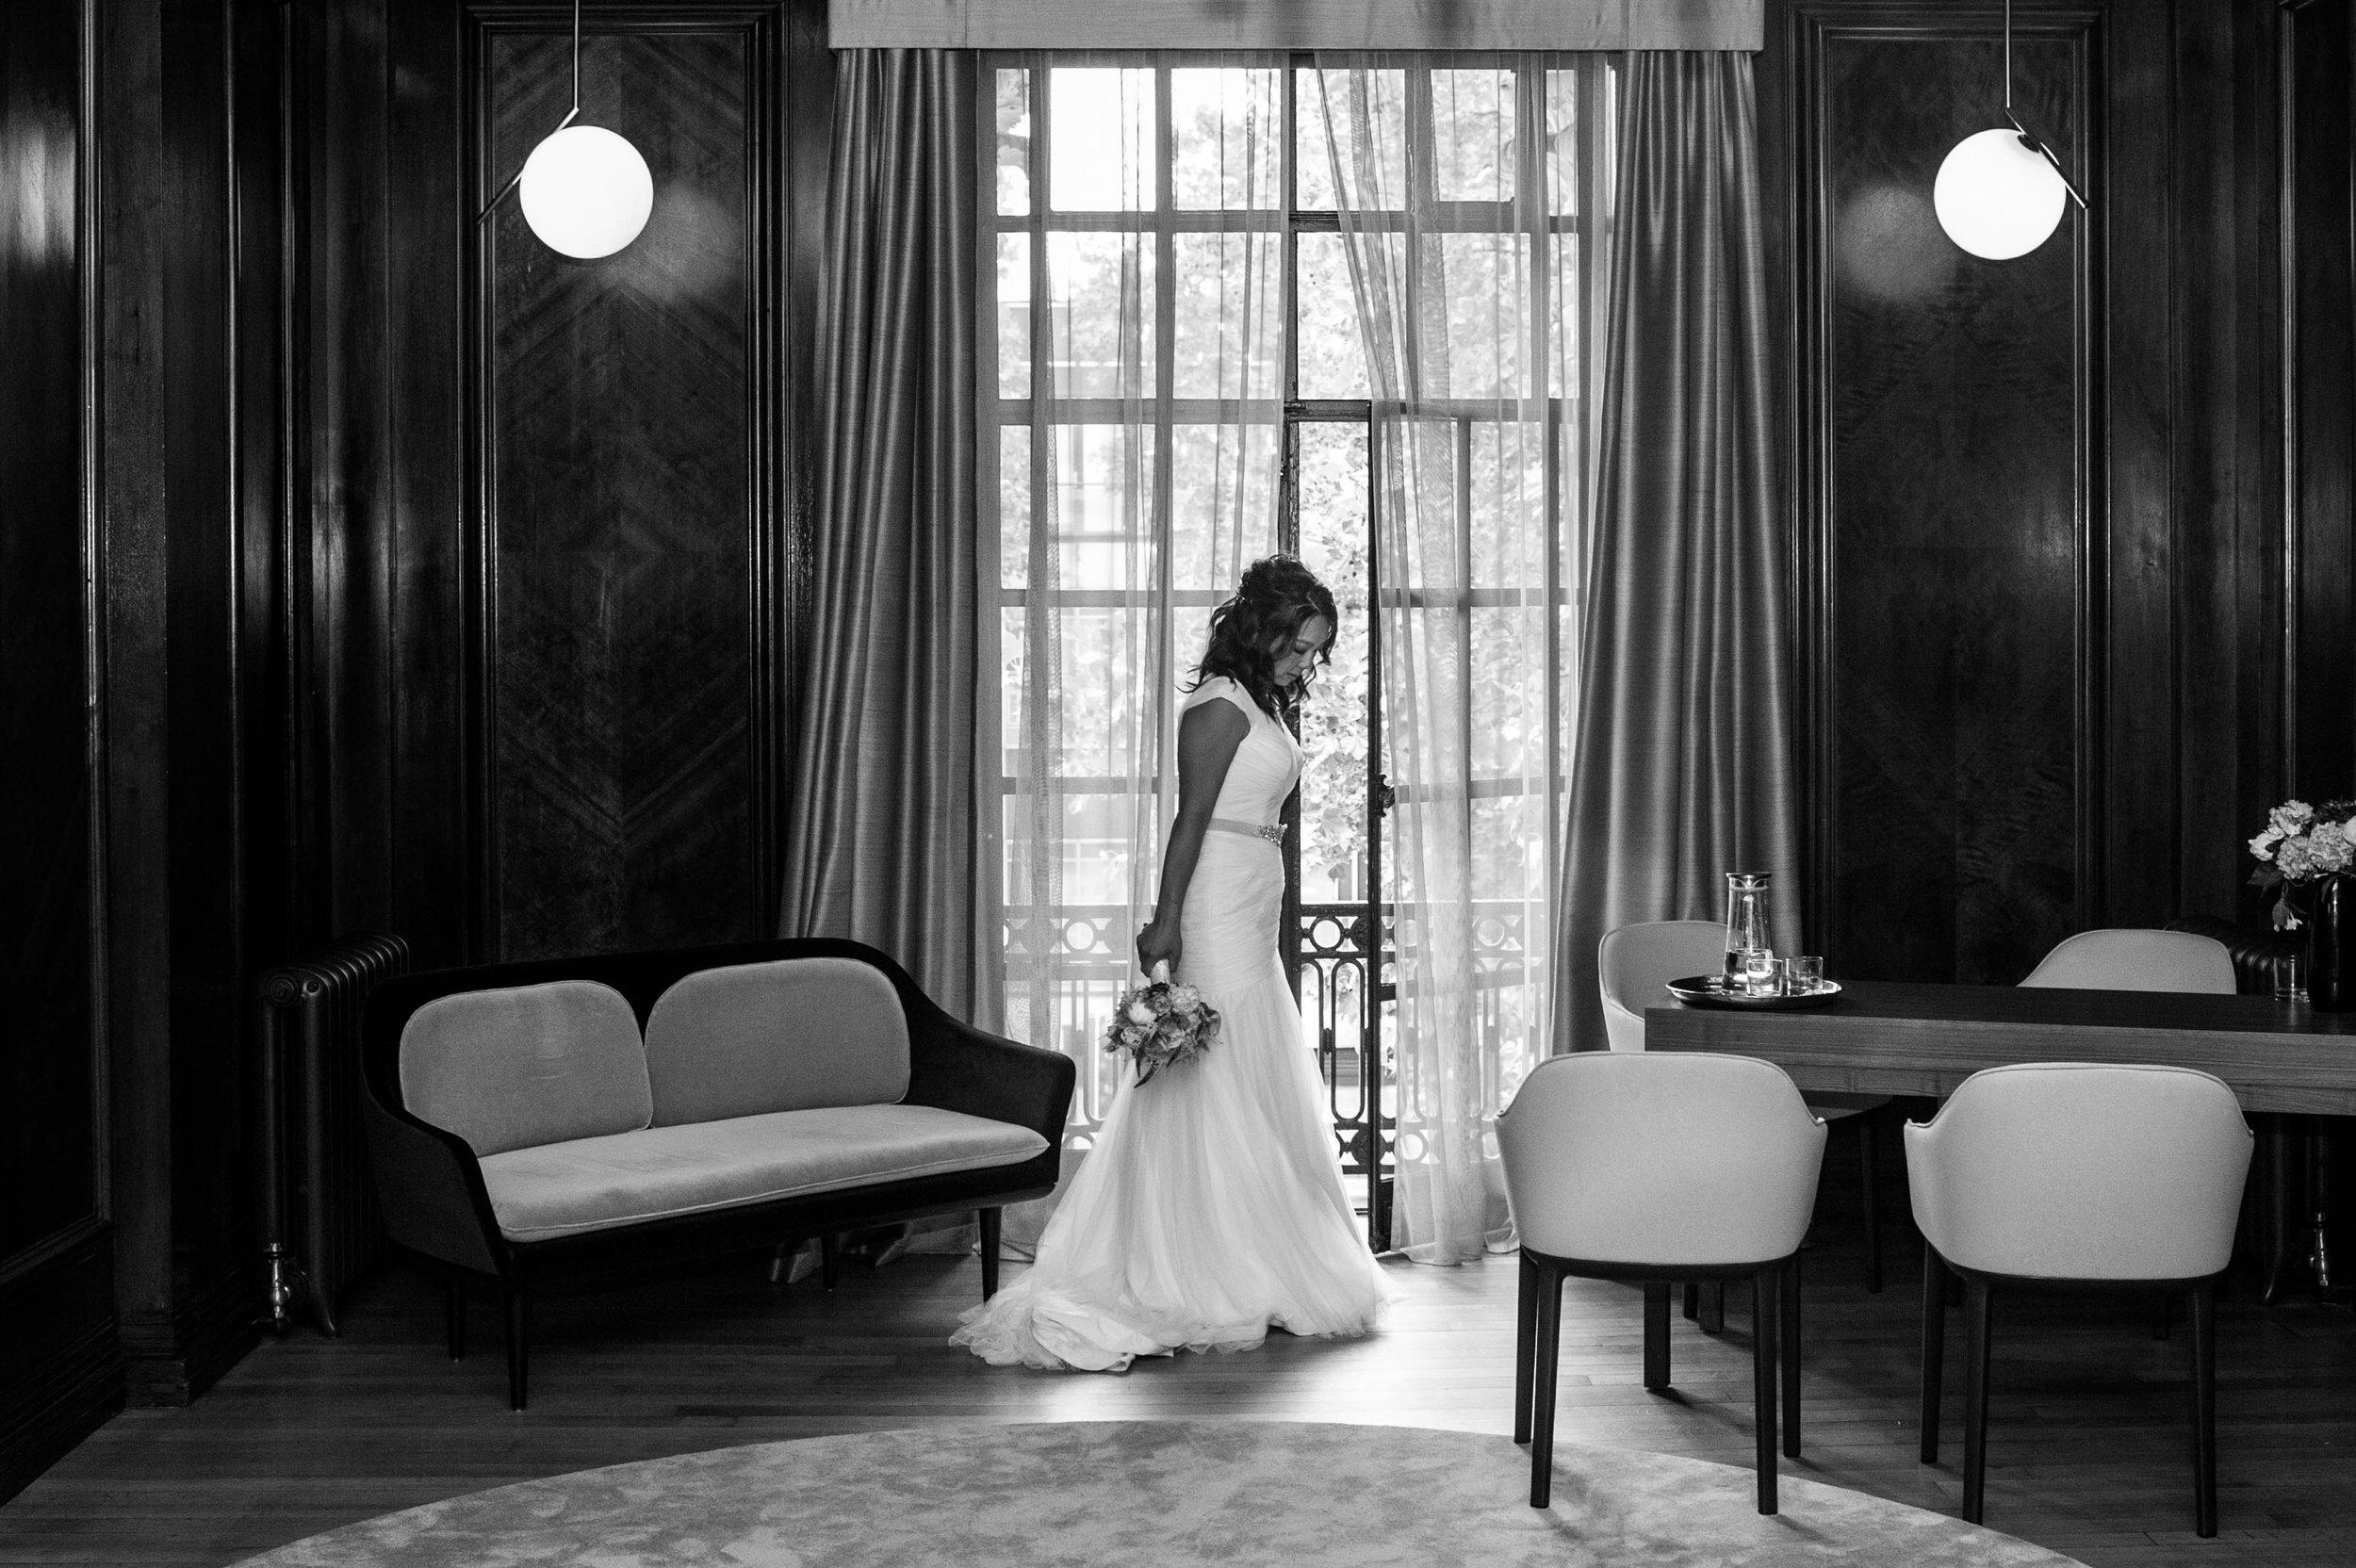 D&M_Marylebone Town Hall Wedding (75 of 239).jpg